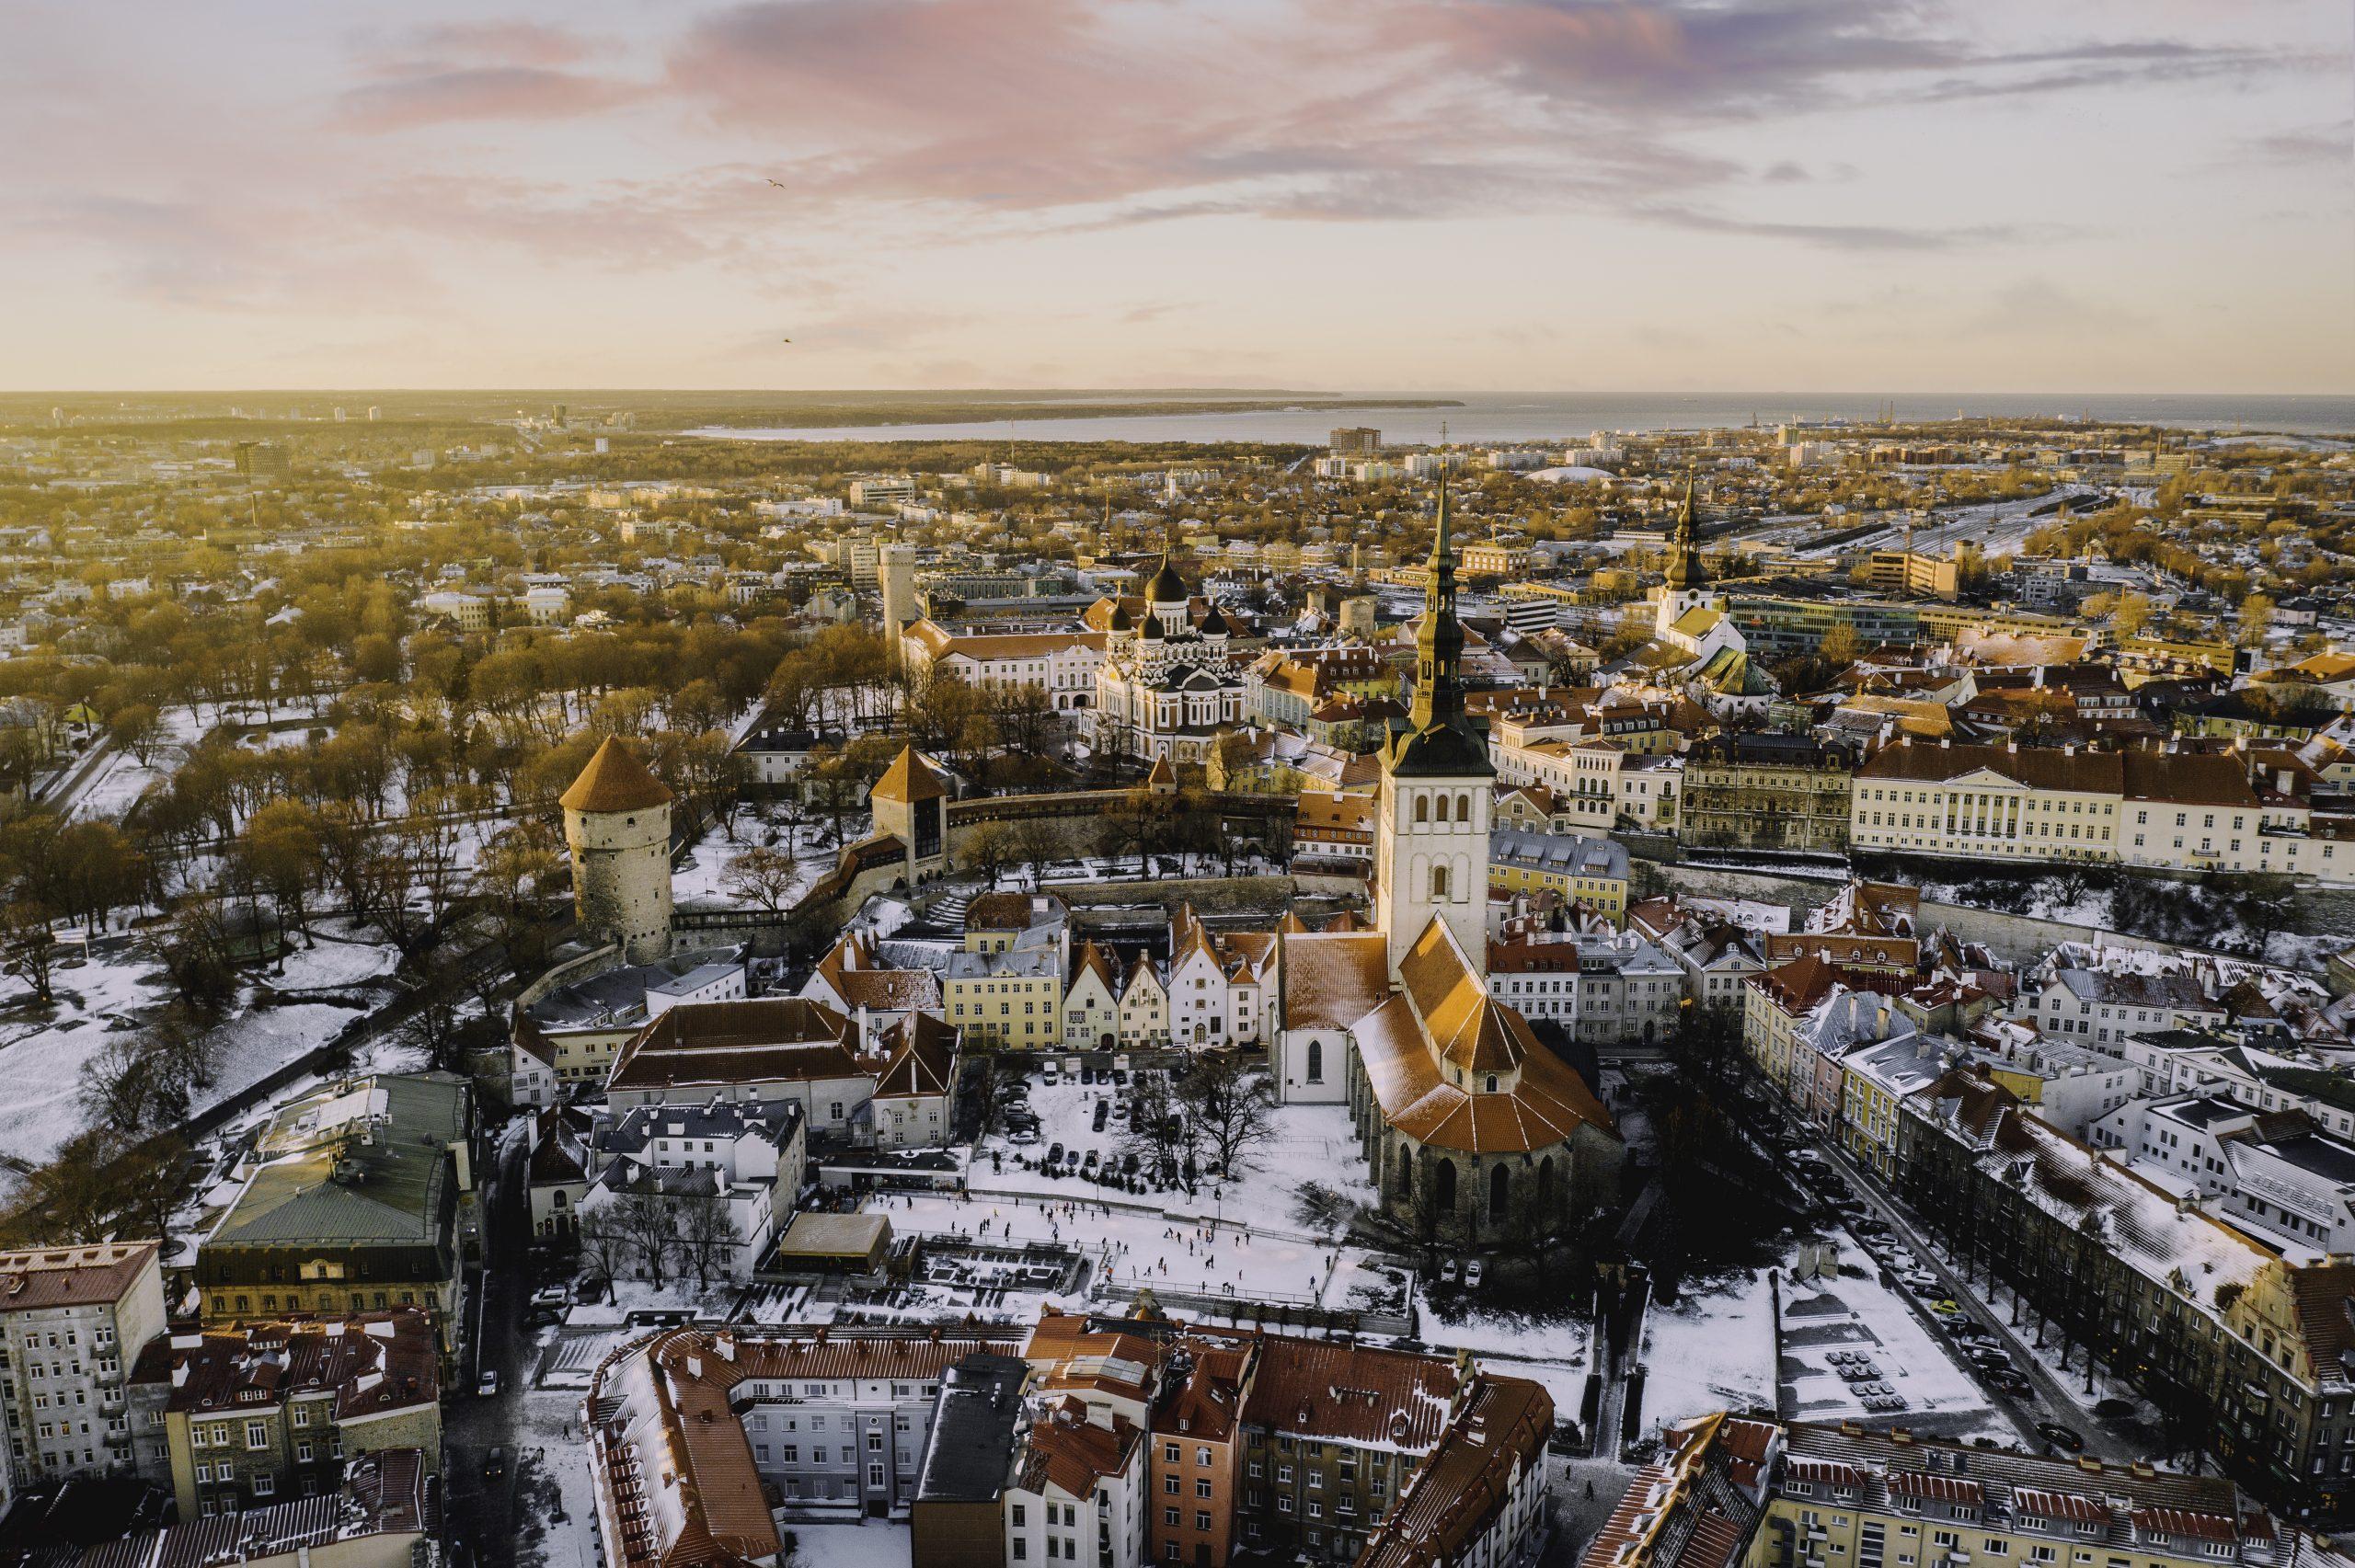 Winter in Old Town Tallinn